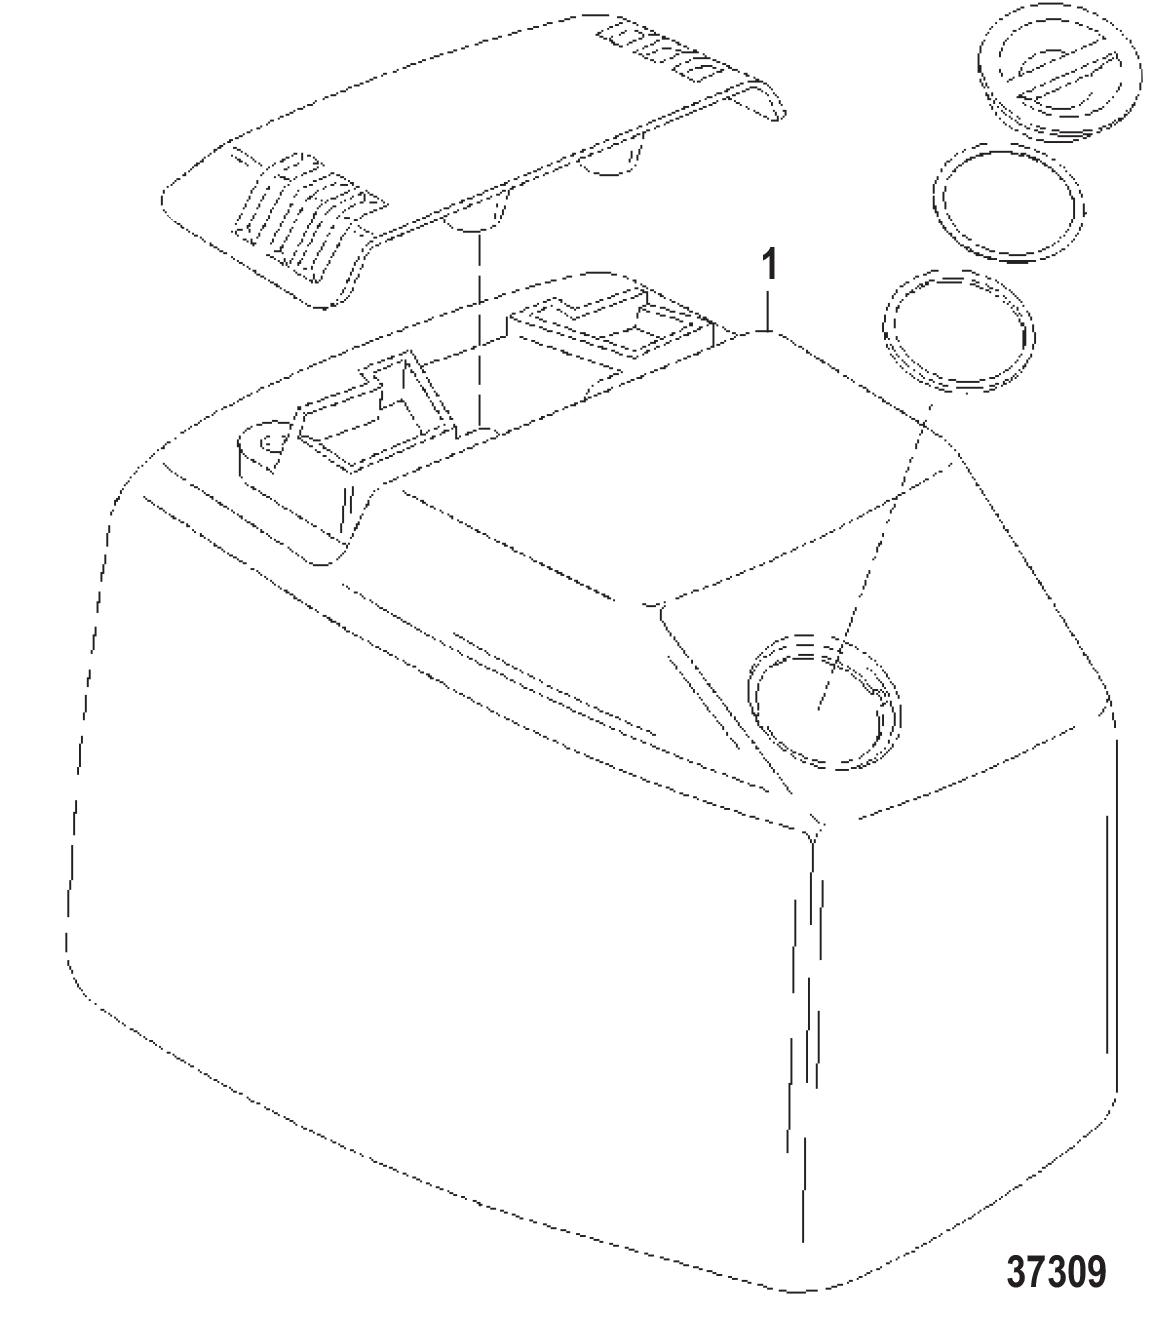 40 Hp Mercury Outboard Wiring Diagram